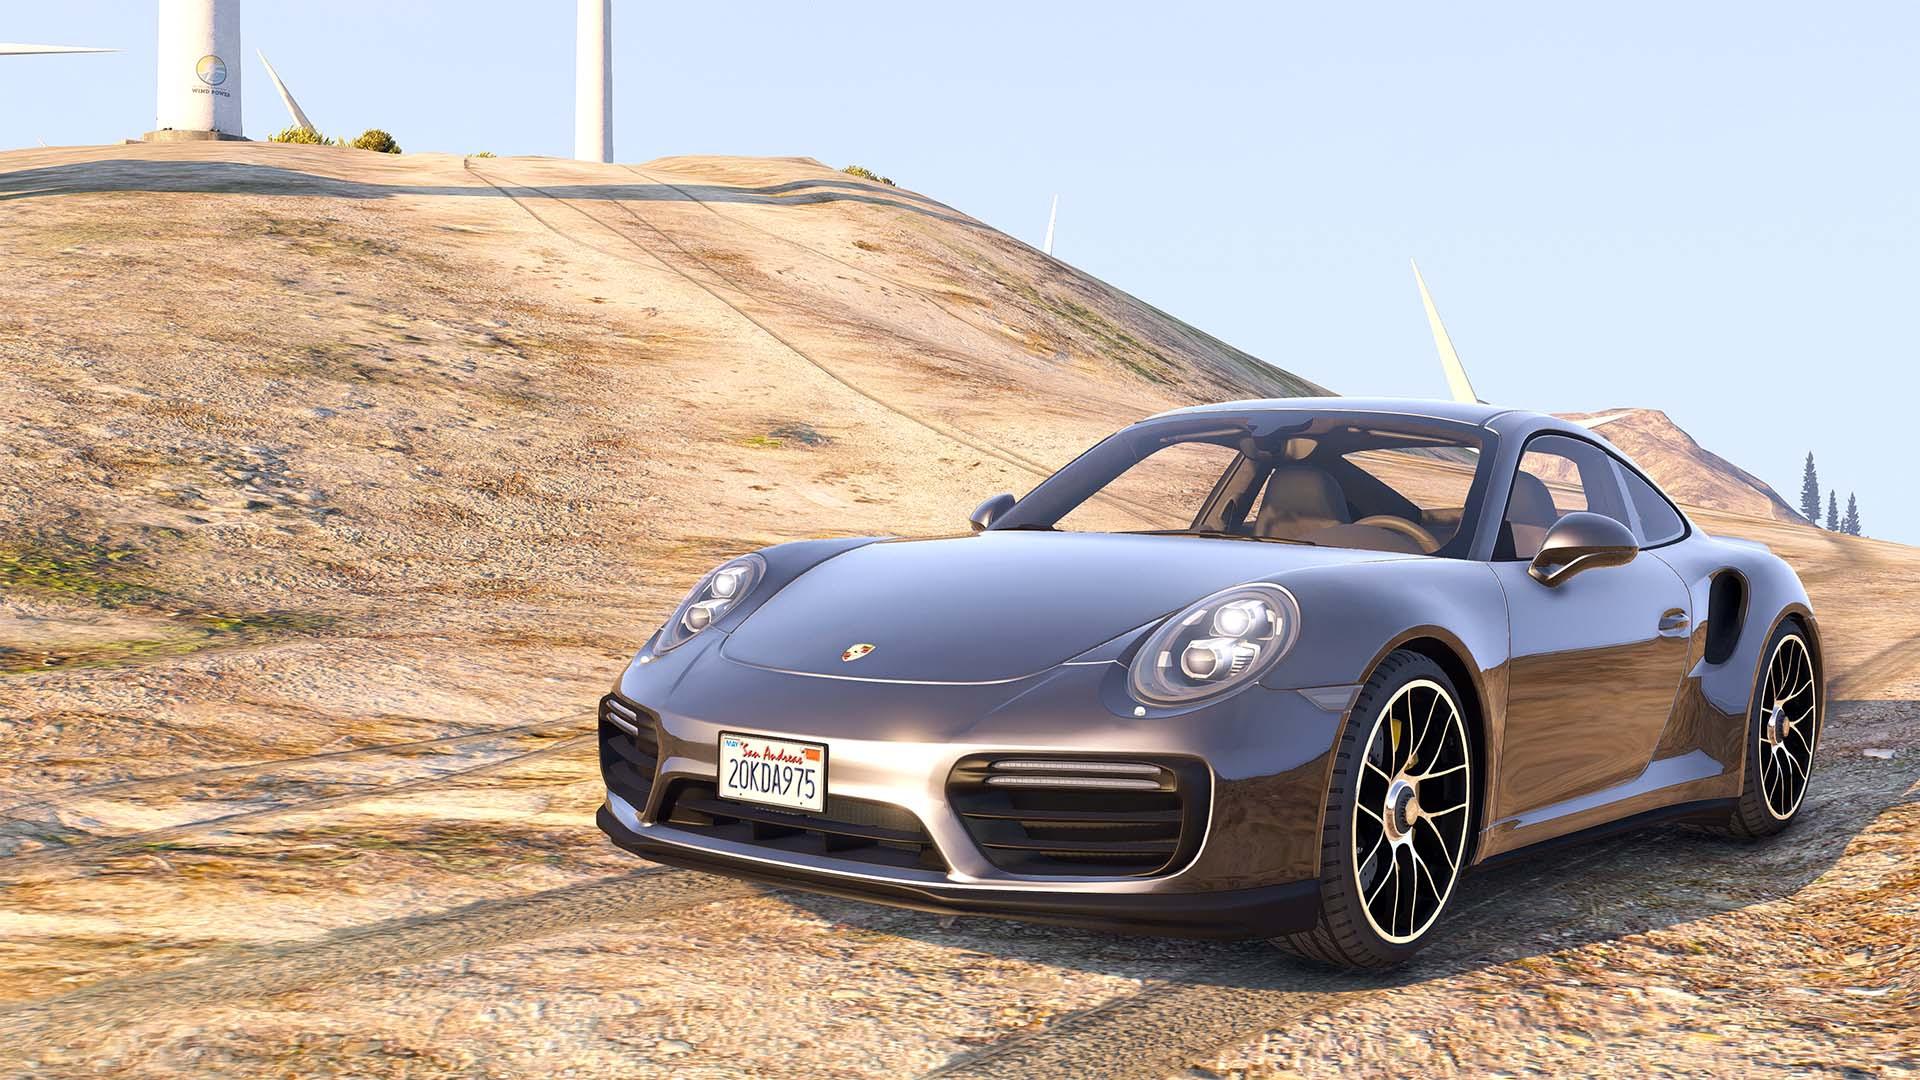 2016 porsche 911 turbo s add on replace auto spoiler. Black Bedroom Furniture Sets. Home Design Ideas